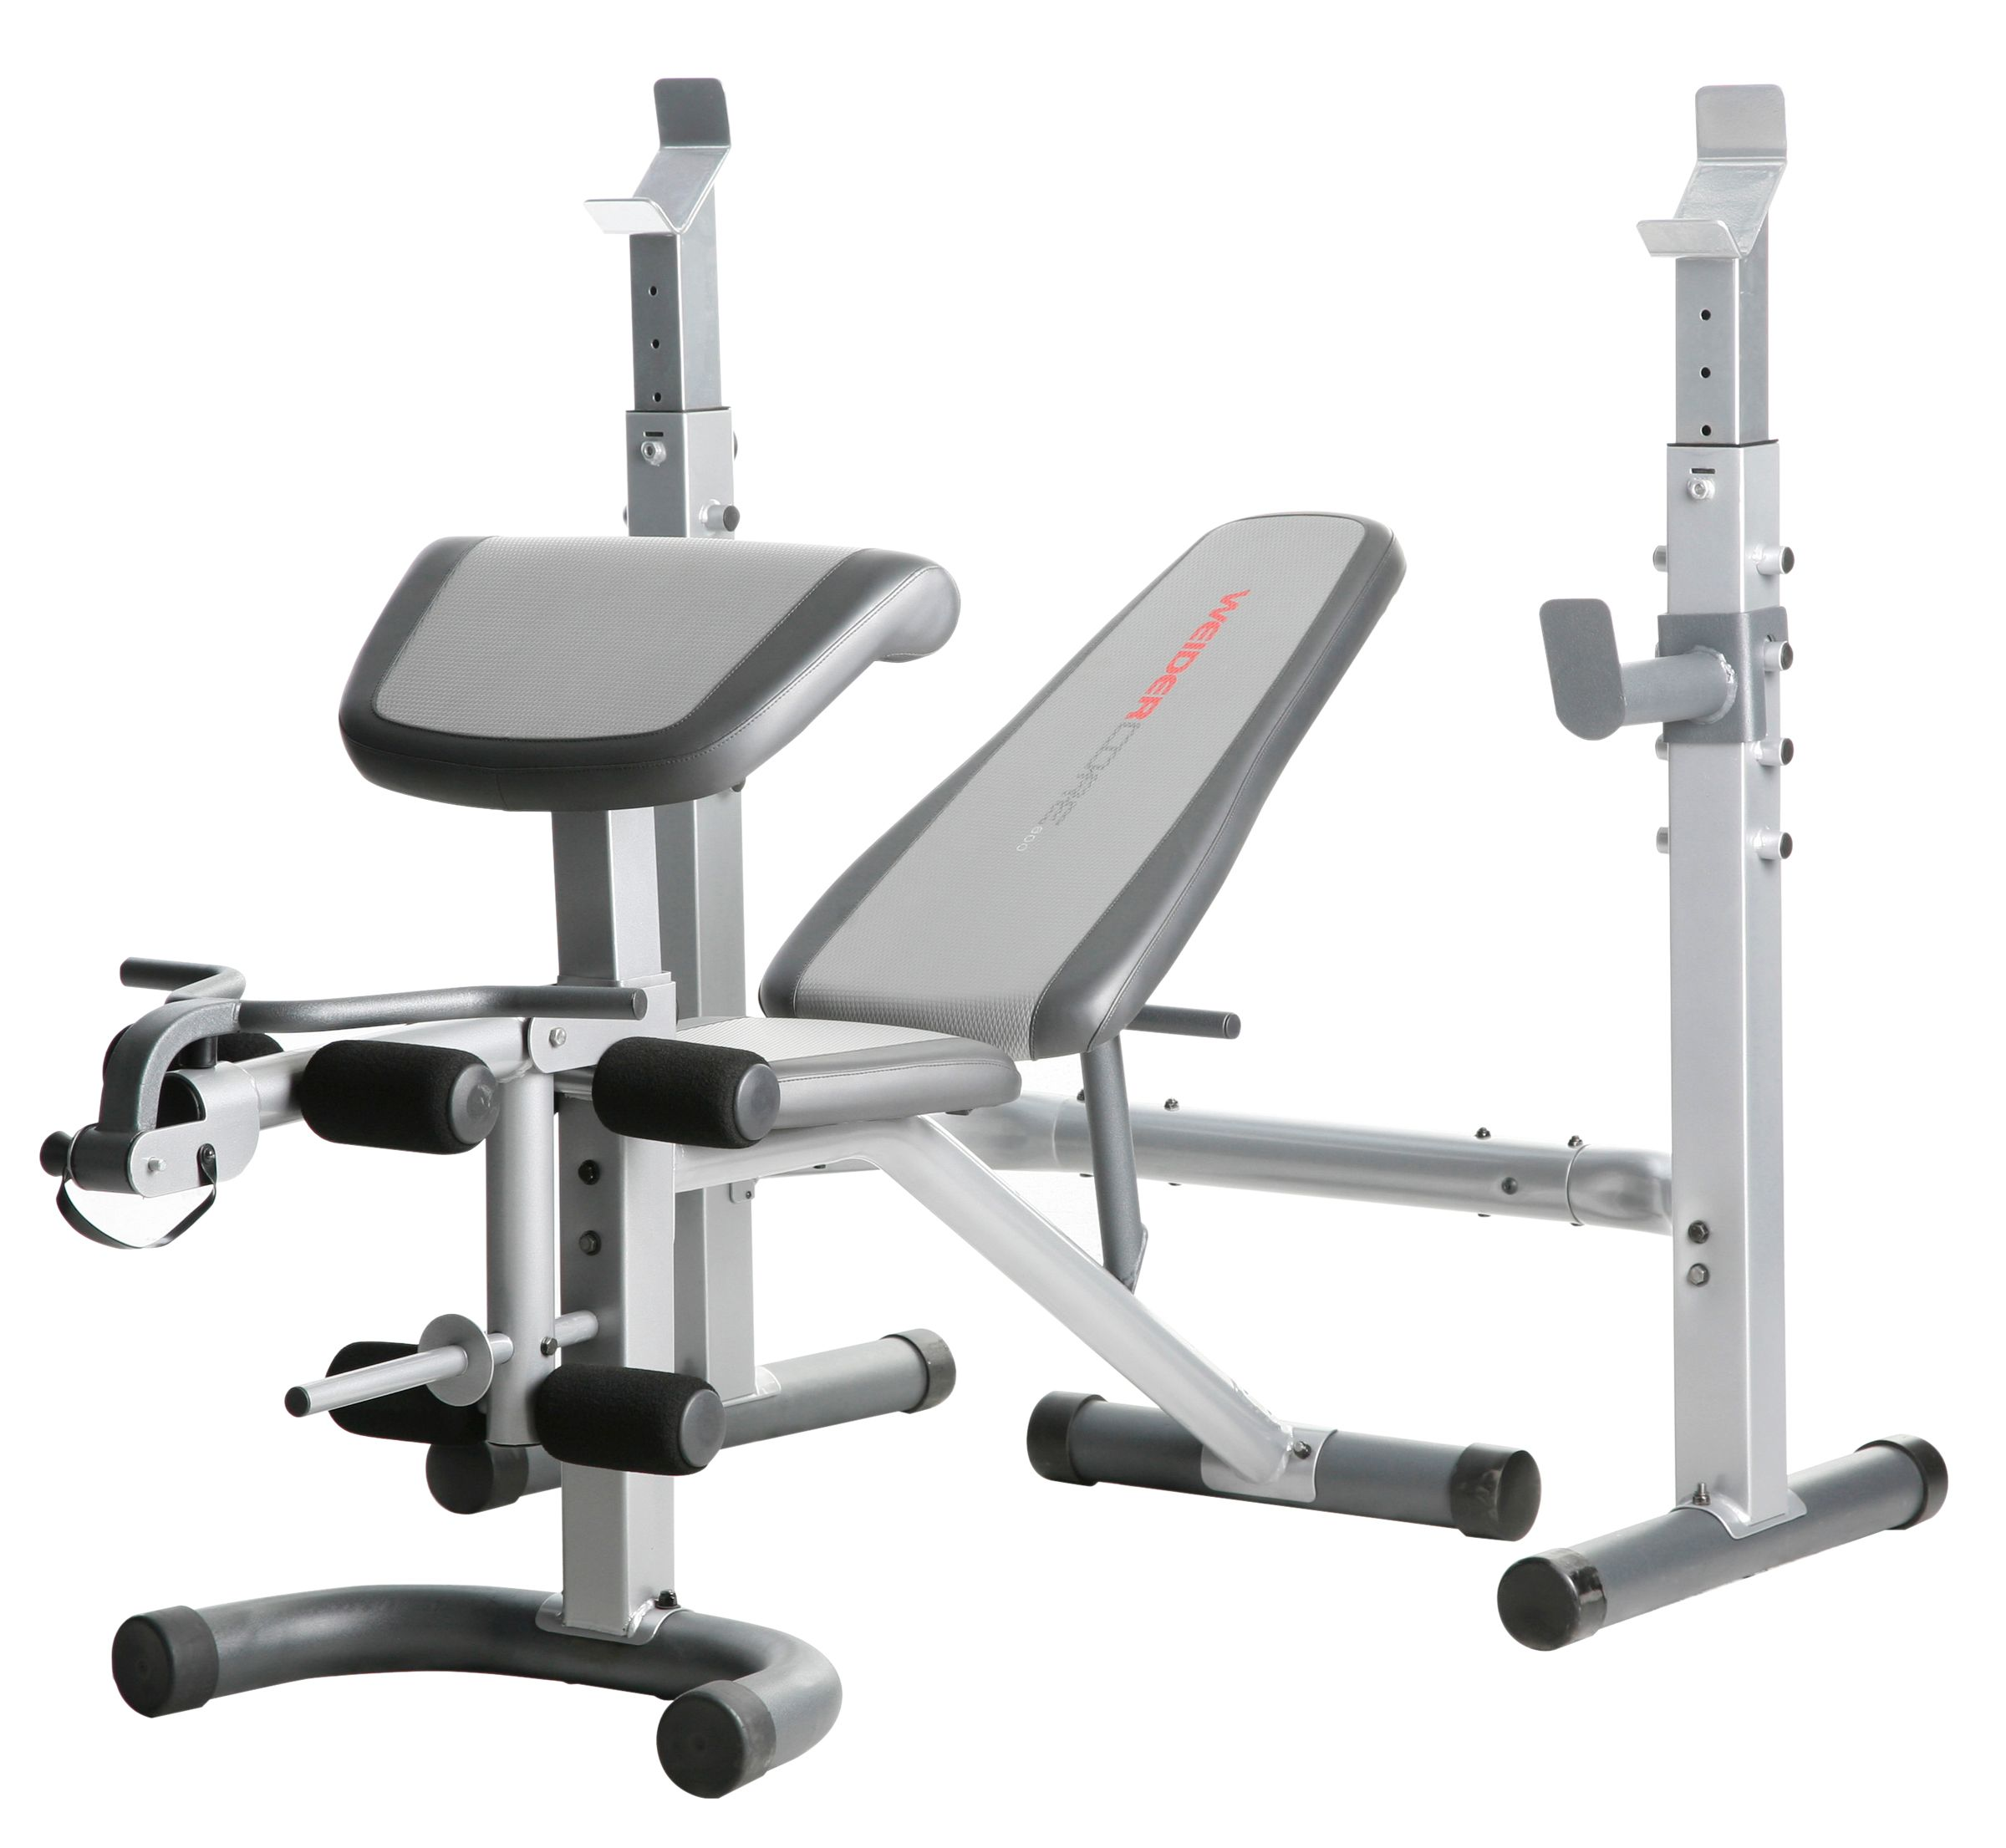 Stationary Bike Aerobic Exercise Seg 1636 Elliptical Trainer Reviews Youtube Used Weight Bench